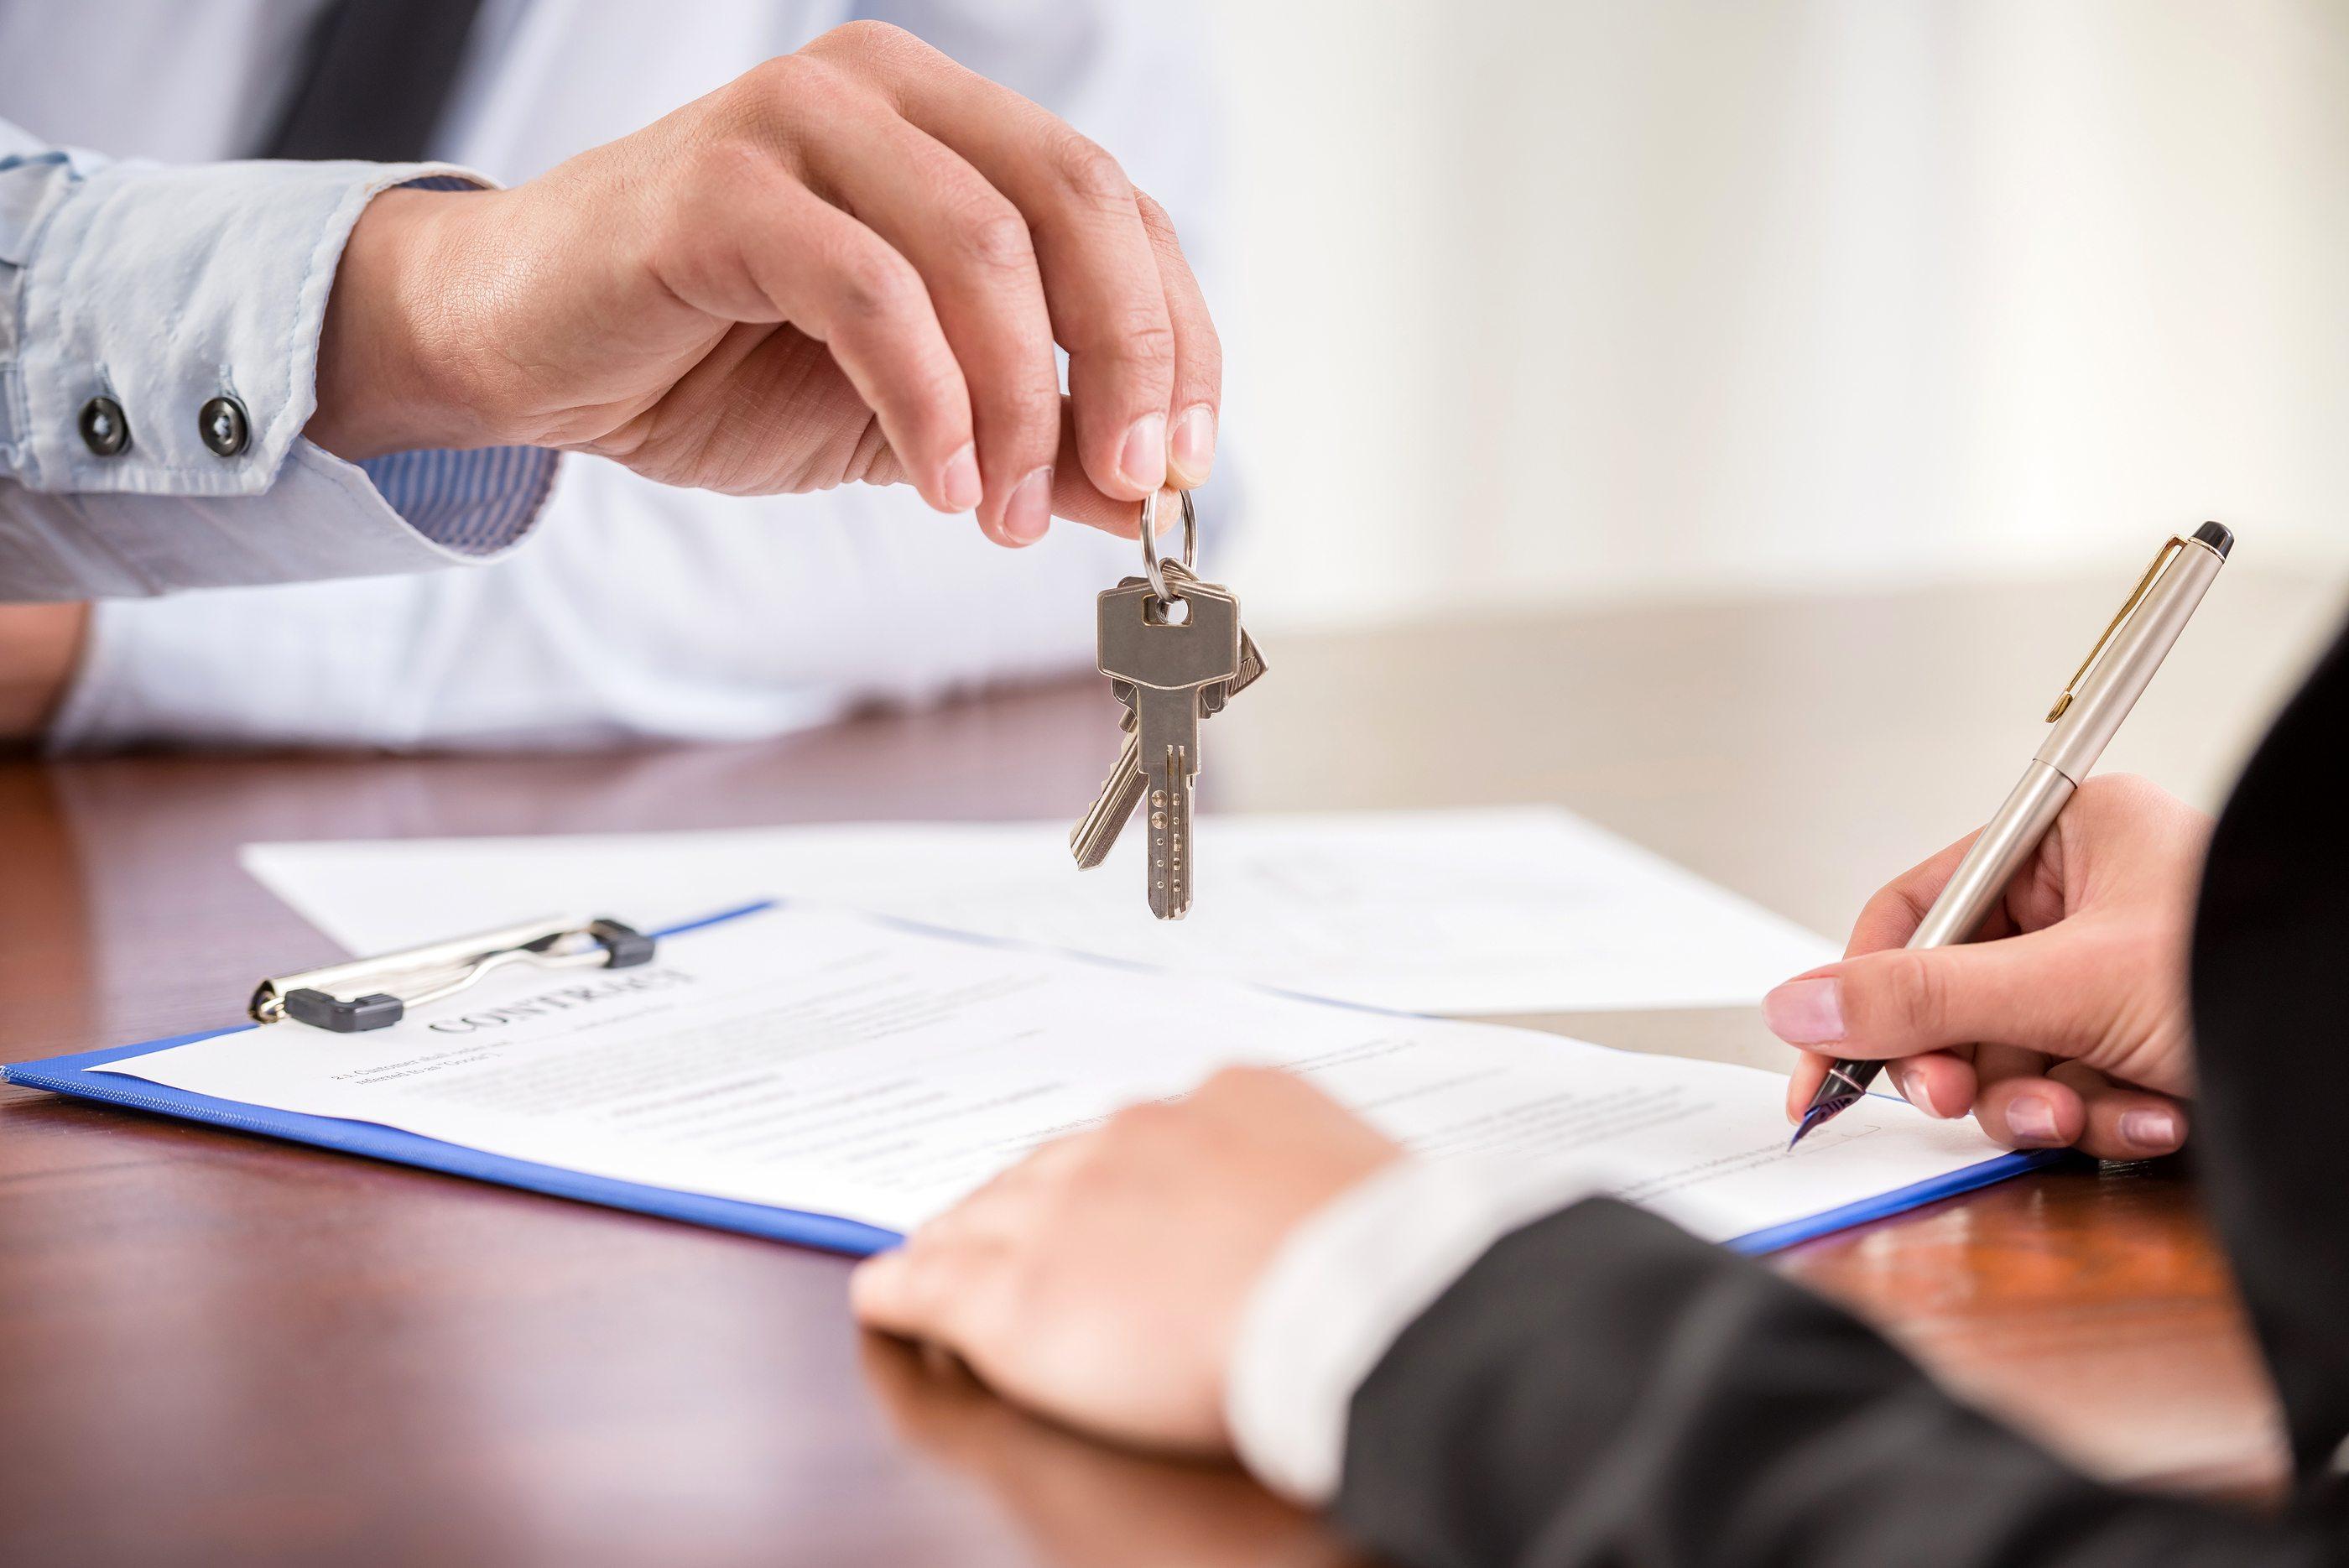 Hunter Creek Condos for Sale - Aspen Real Estate Listings